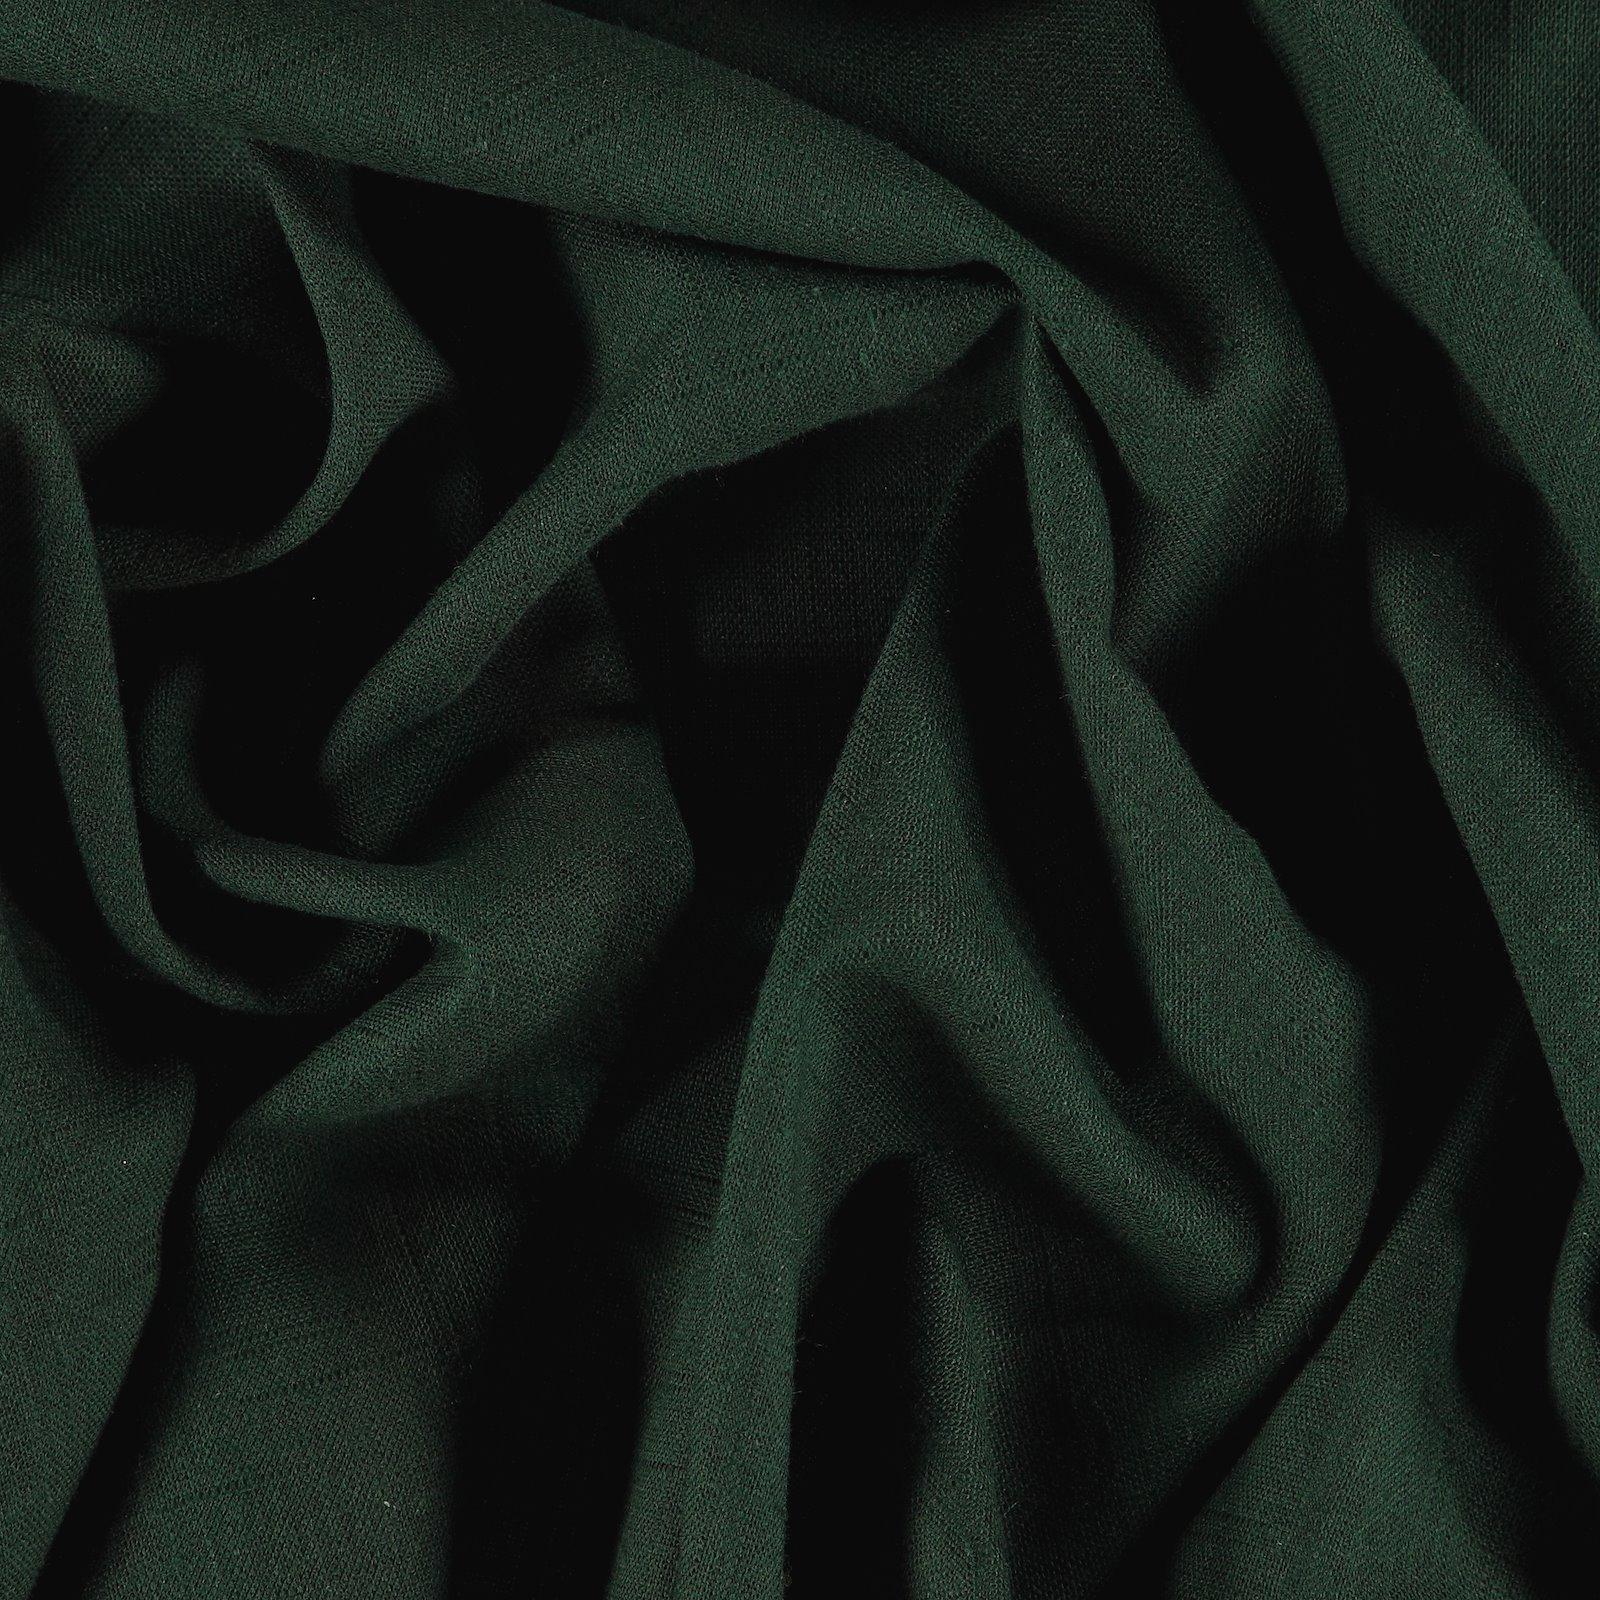 Coarse linen/viscose dark bottle green 852320_pack